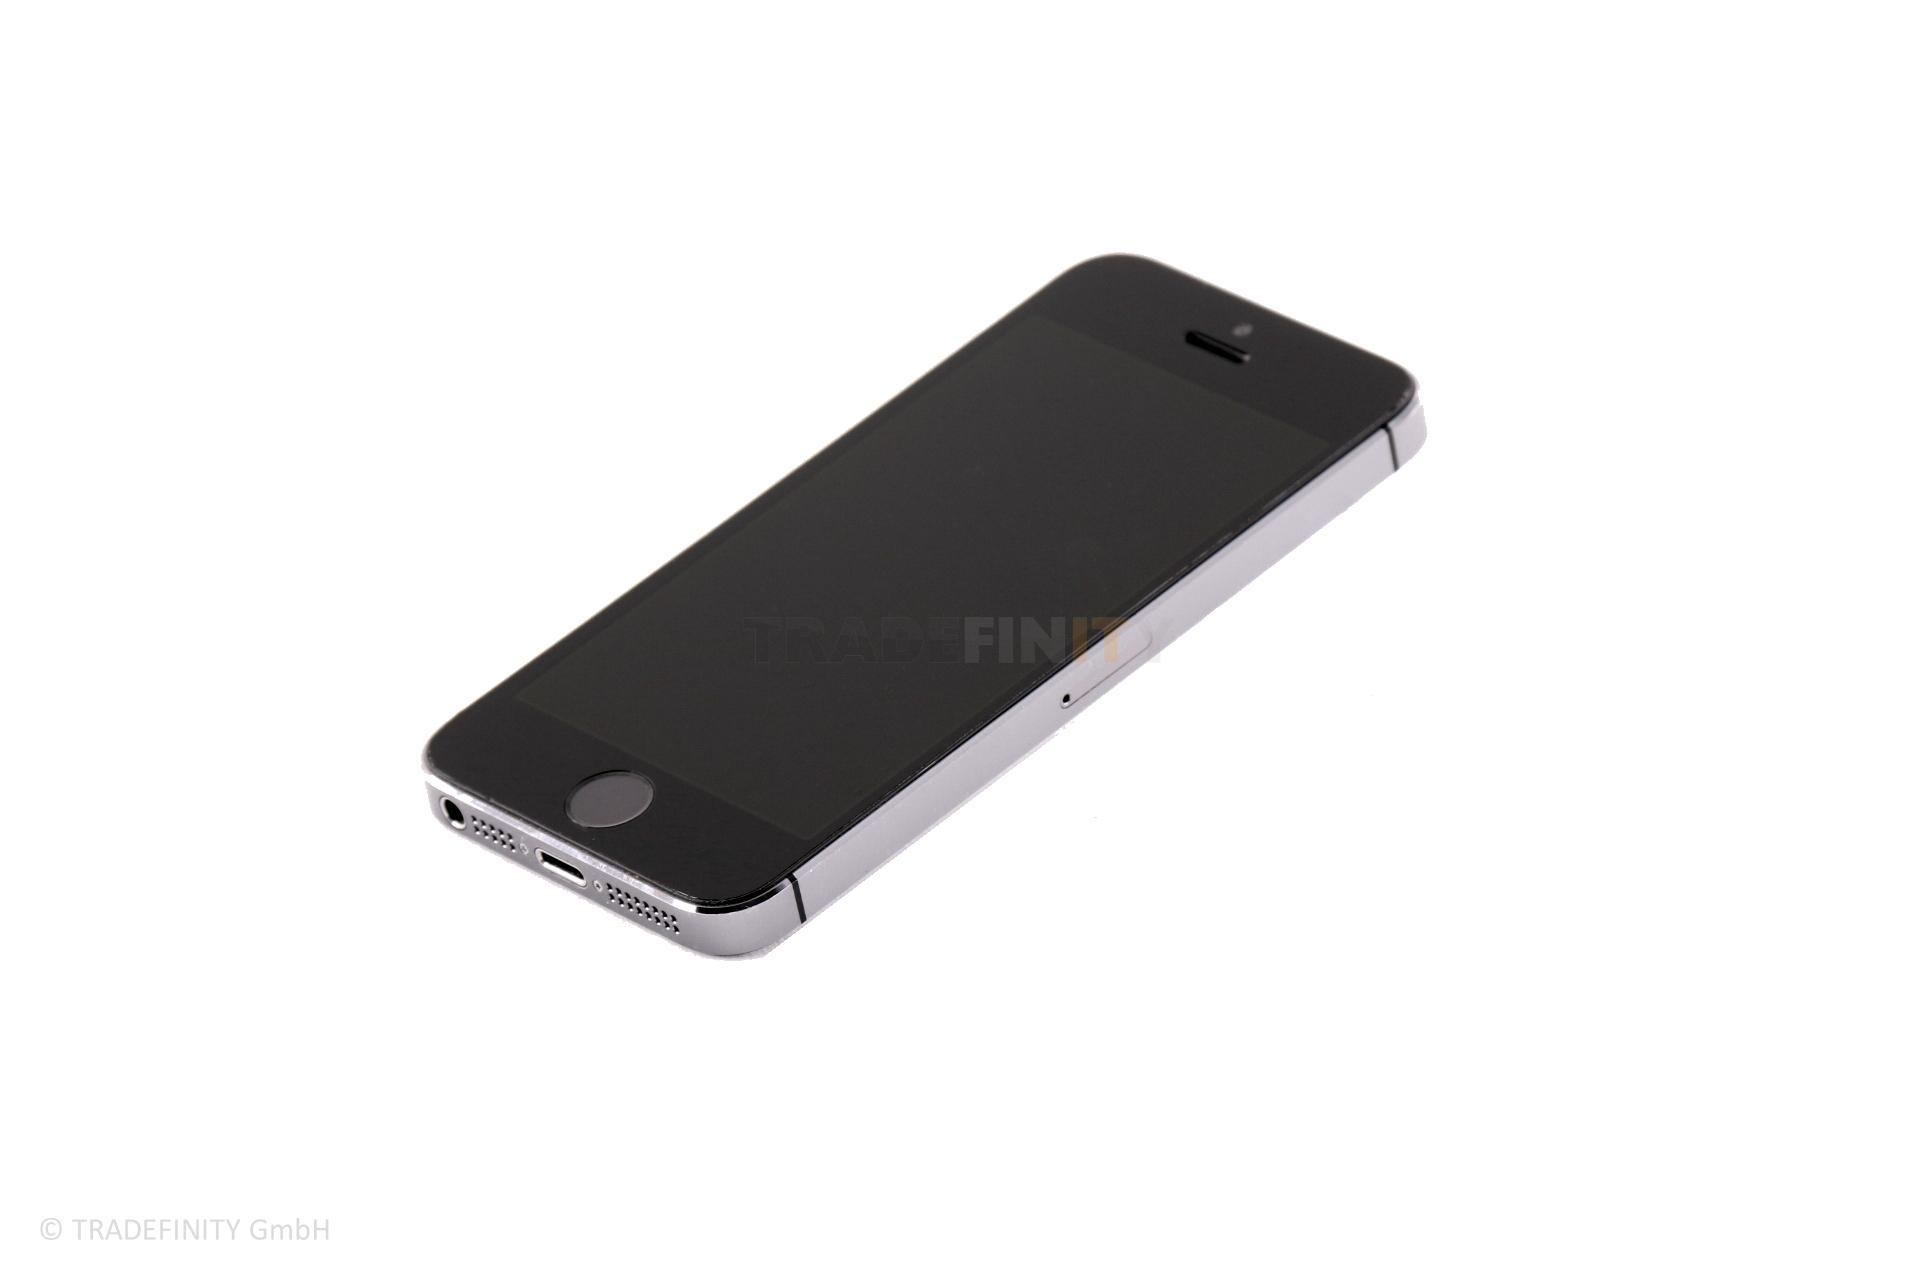 Apple iPhone 5S (16 GB) Space Gray